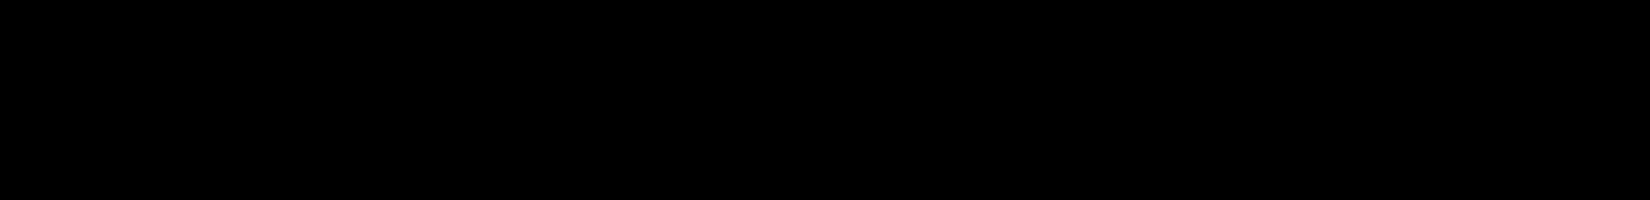 Vineyard Churches UK logo and link